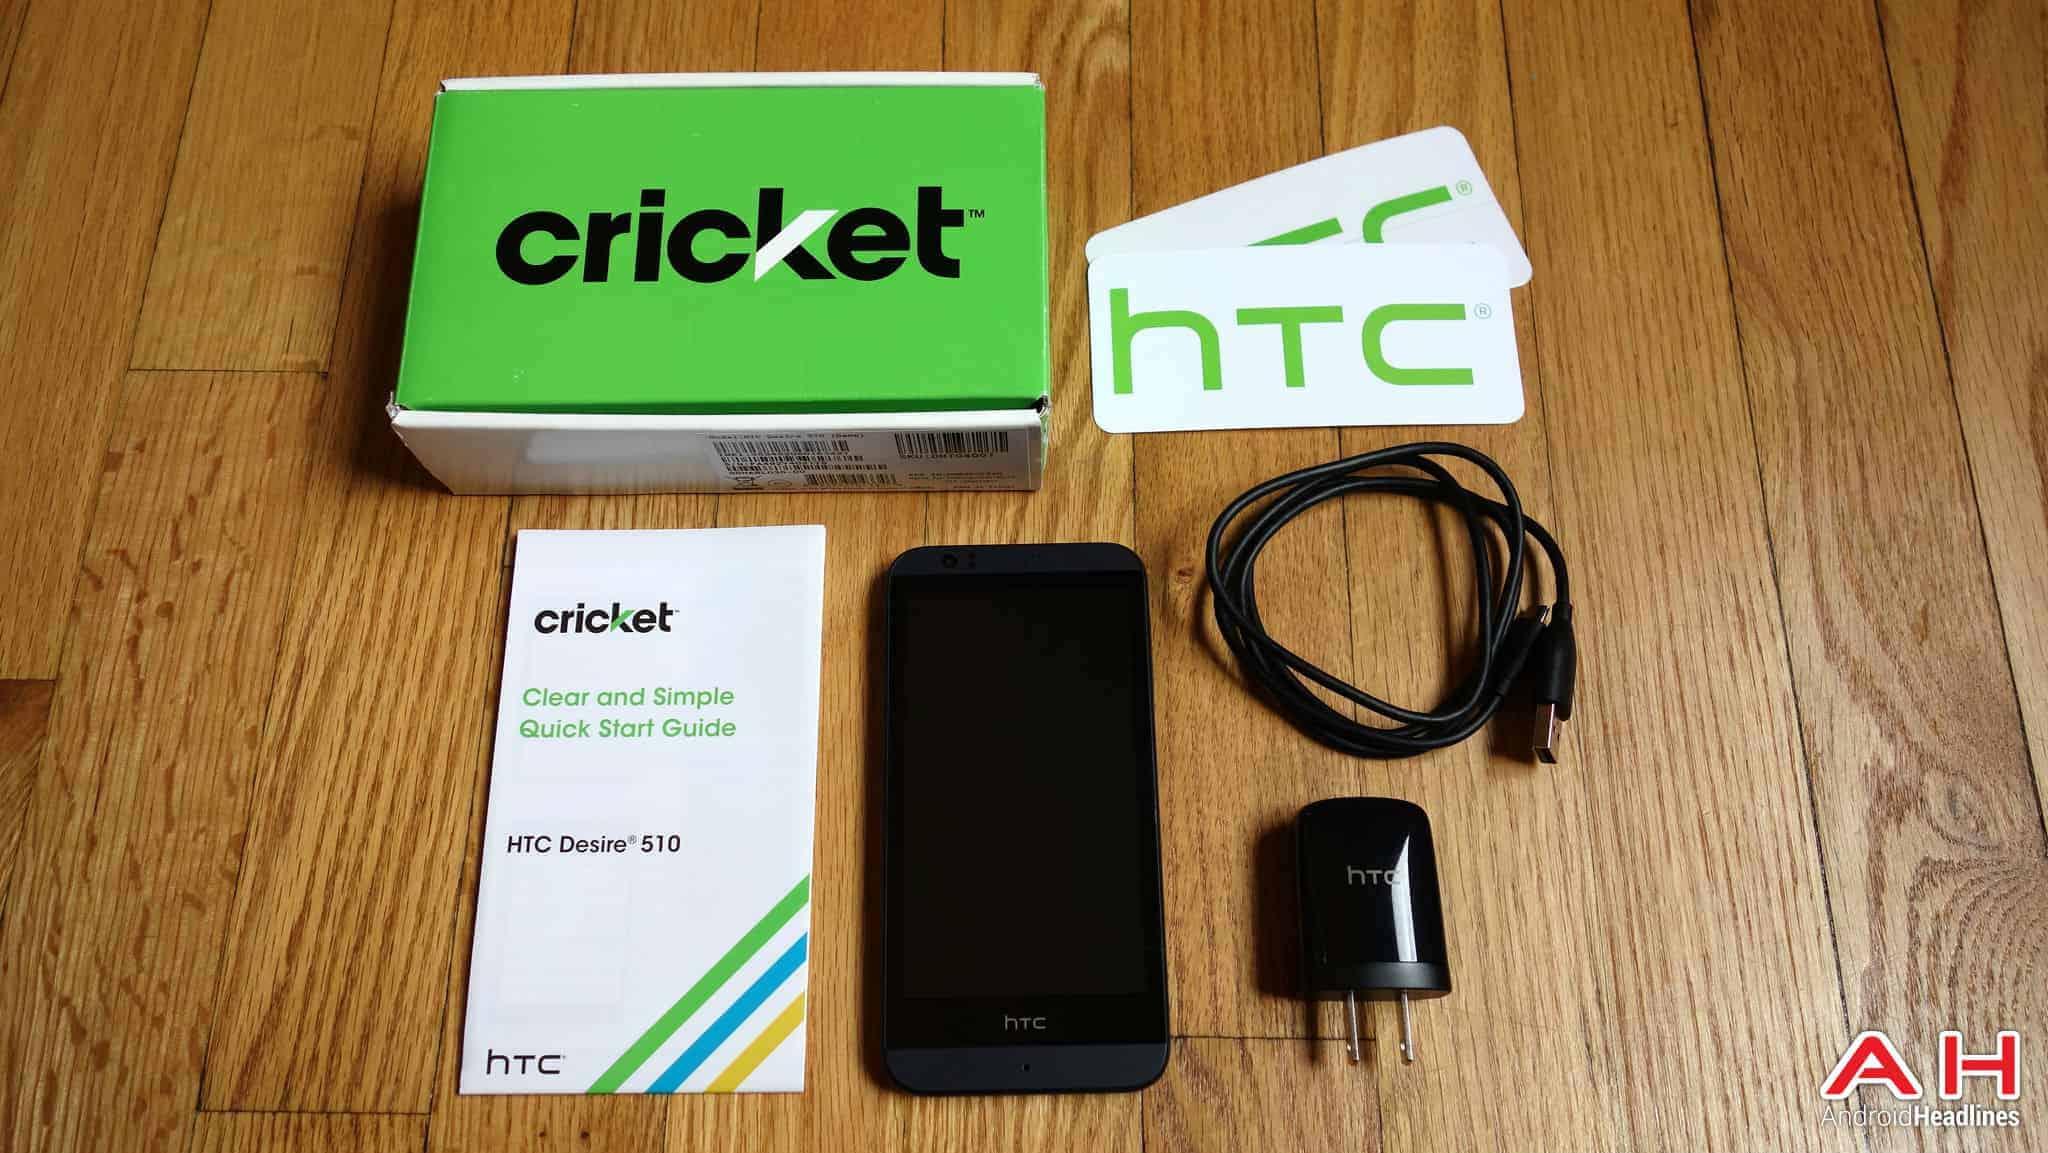 htc desire 510 cricket